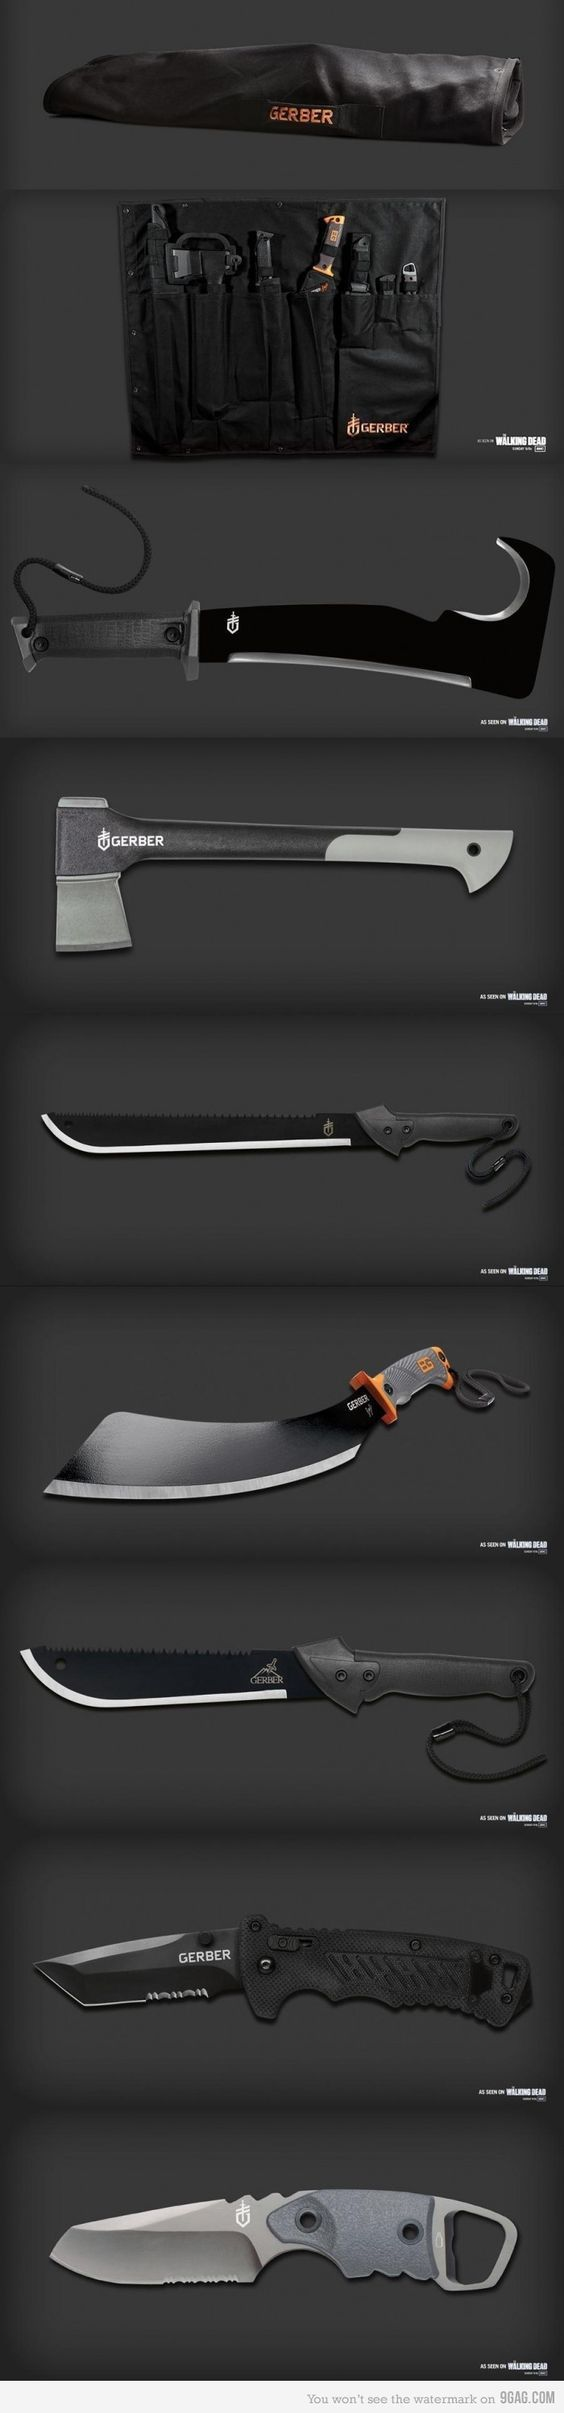 Gerber Zombie Apocalypse Survival Kit @thistookmymoney